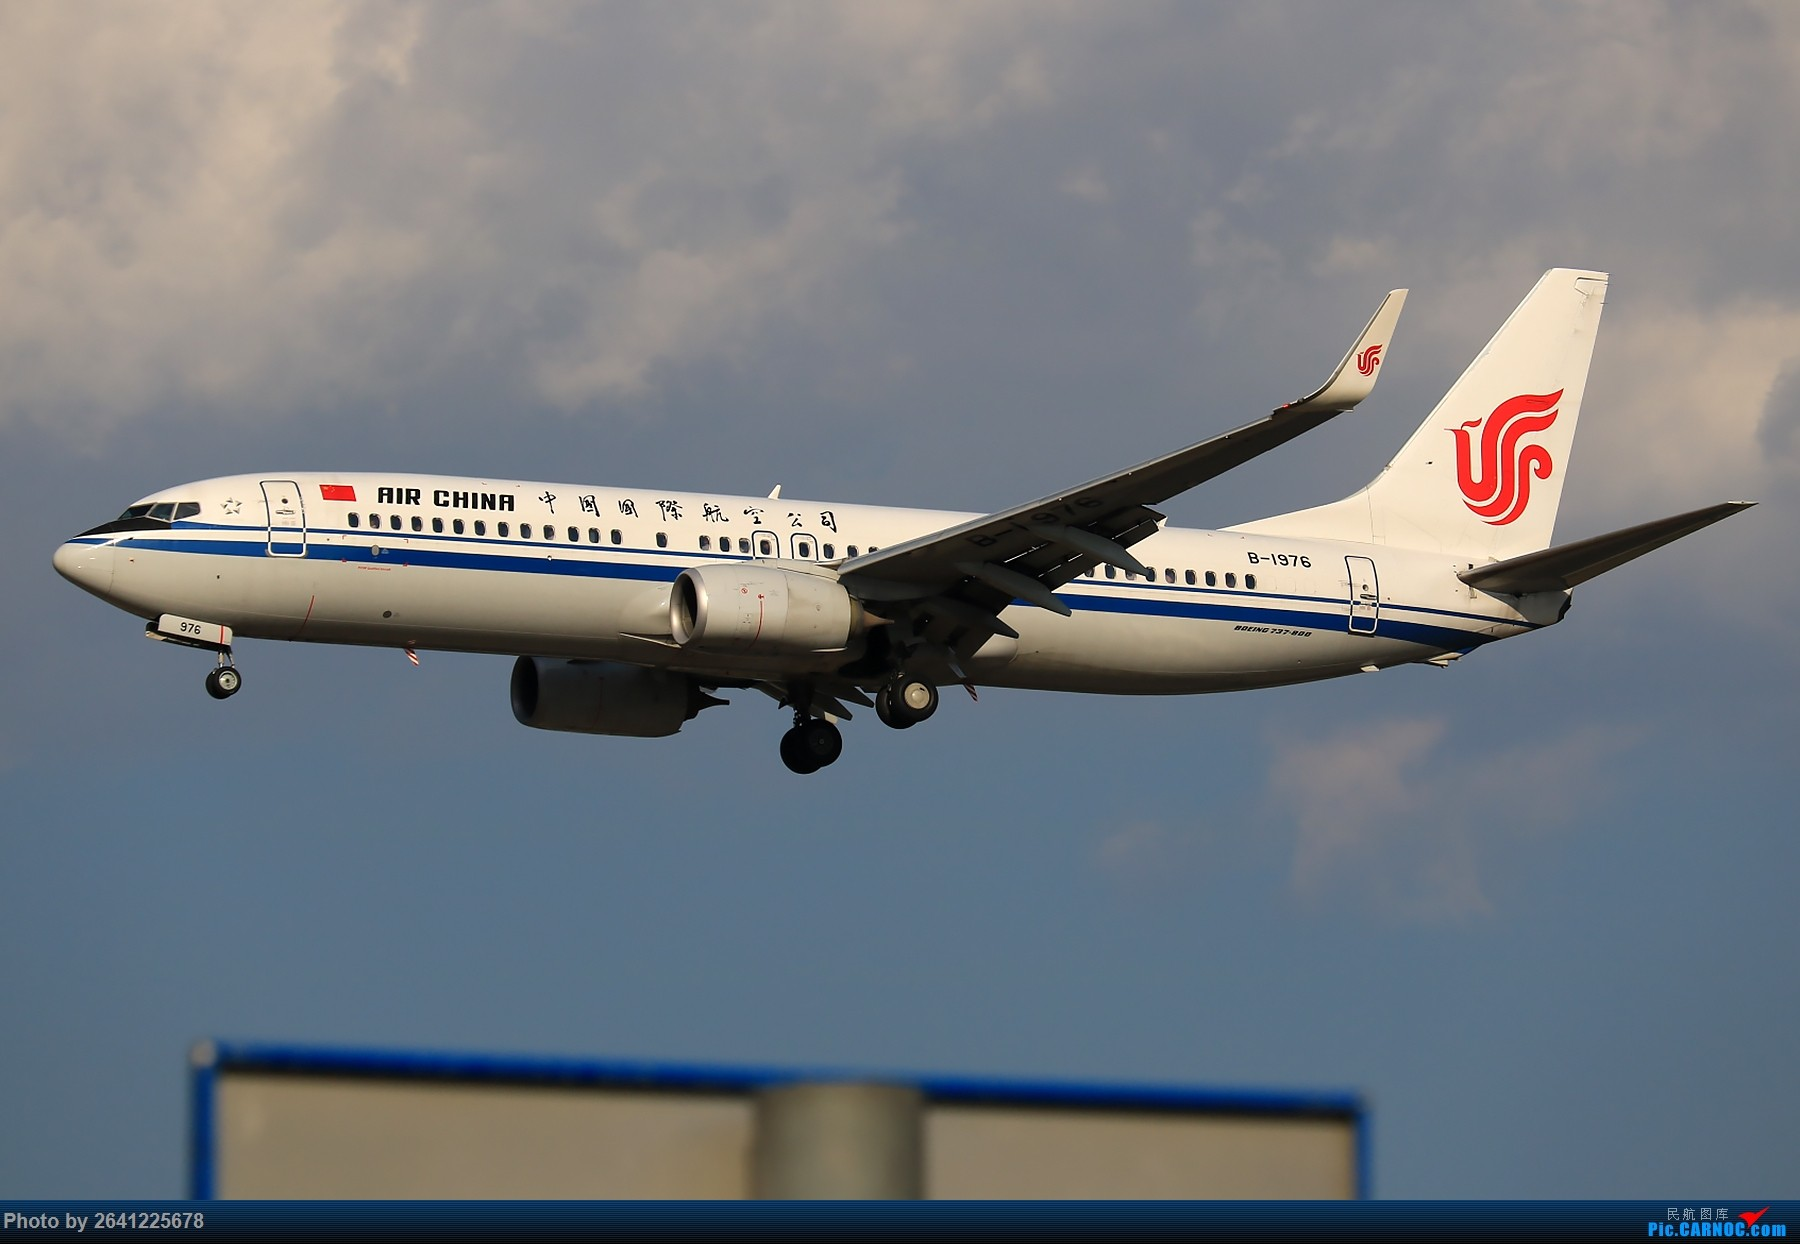 Re:[原创]【PEK】趁着水晶天去拍机(9 pics) BOEING 737-800 B-1976 中国北京首都国际机场